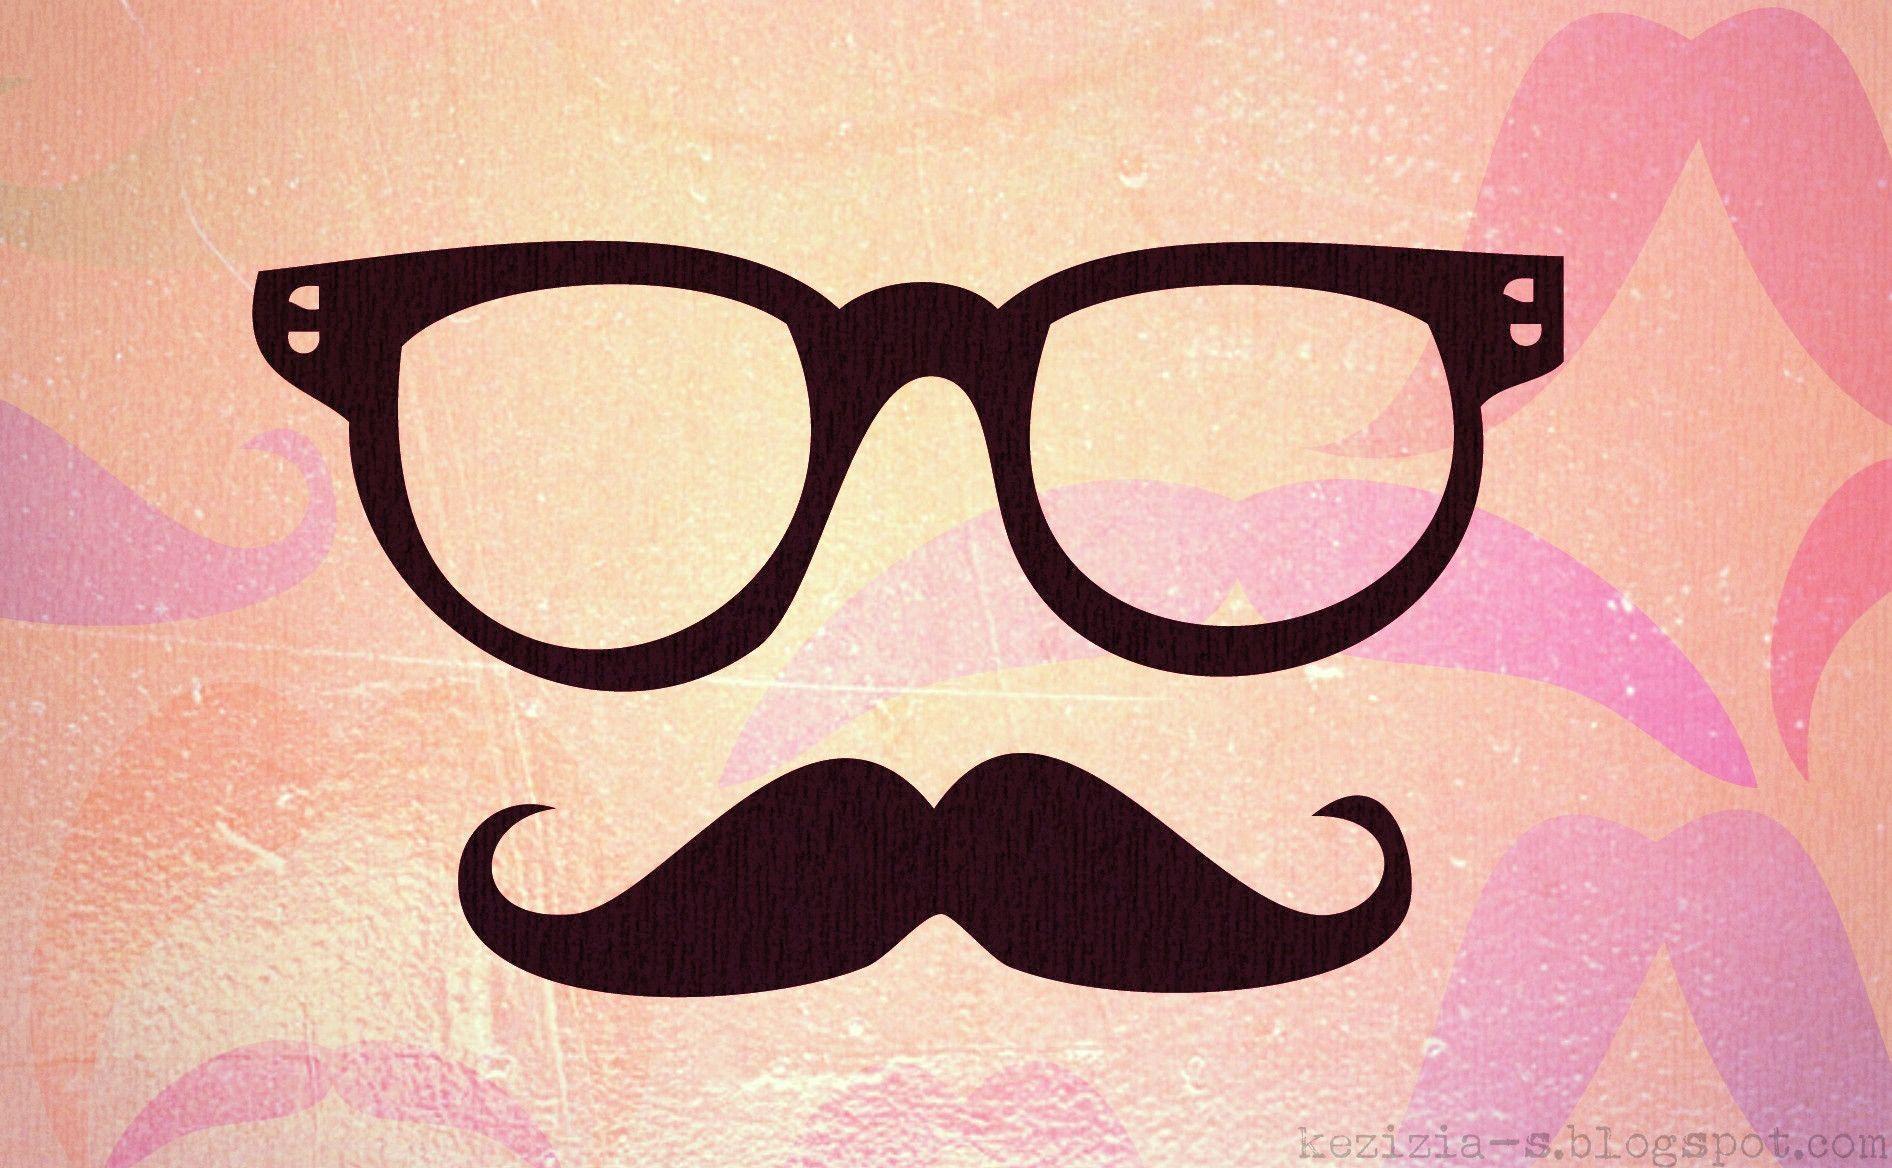 Outstanding Mustache Wallpapers Wallpaper Cave Short Hairstyles Gunalazisus